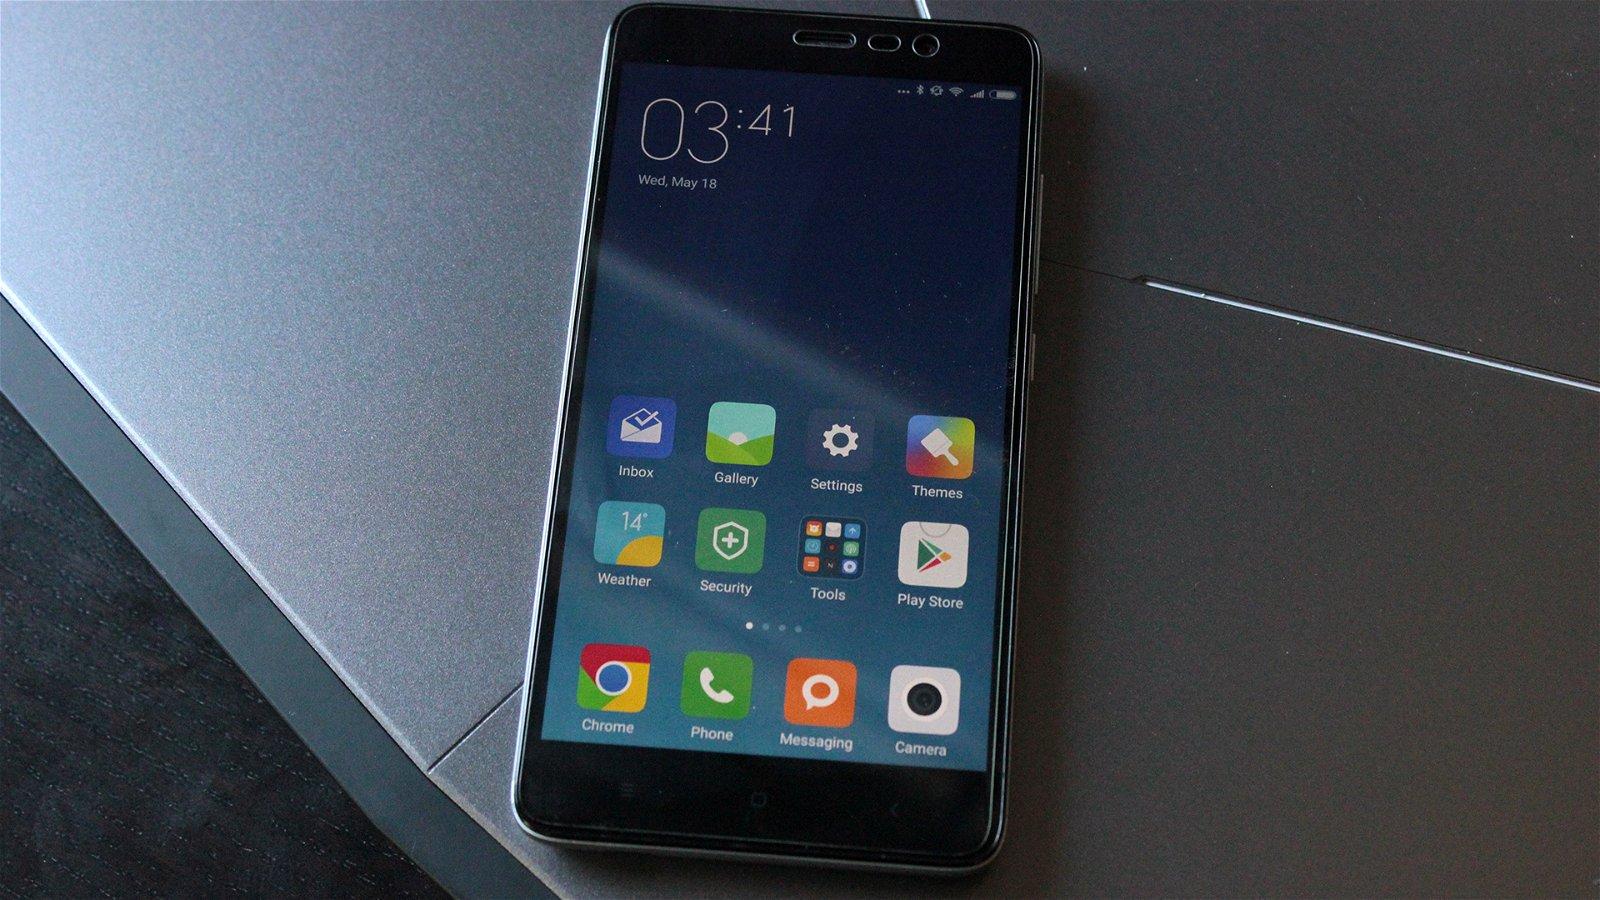 Xiaomi Redmi Note 3 Pro (Hardware) Review 3